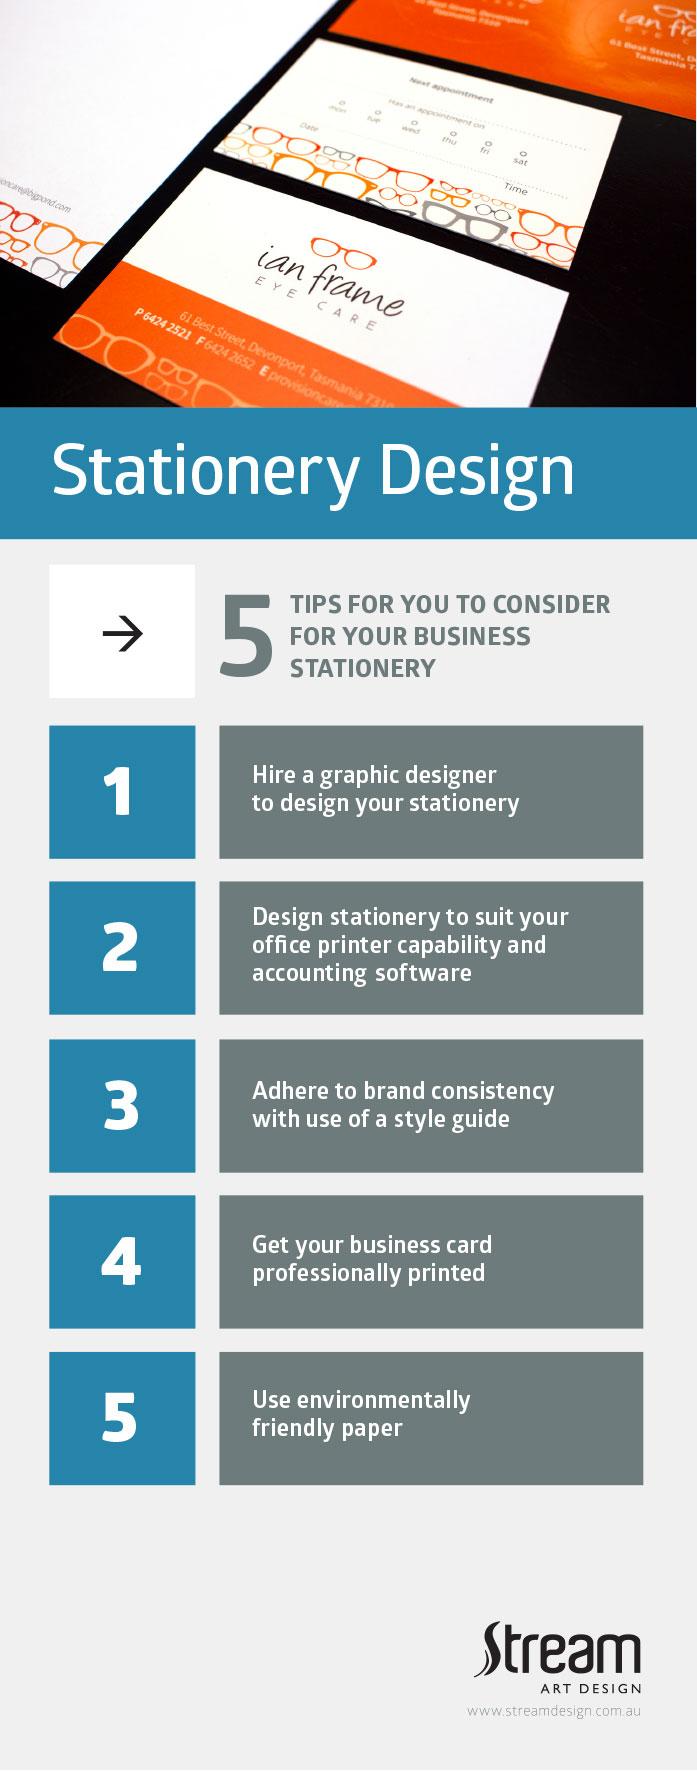 stream design stationery tips